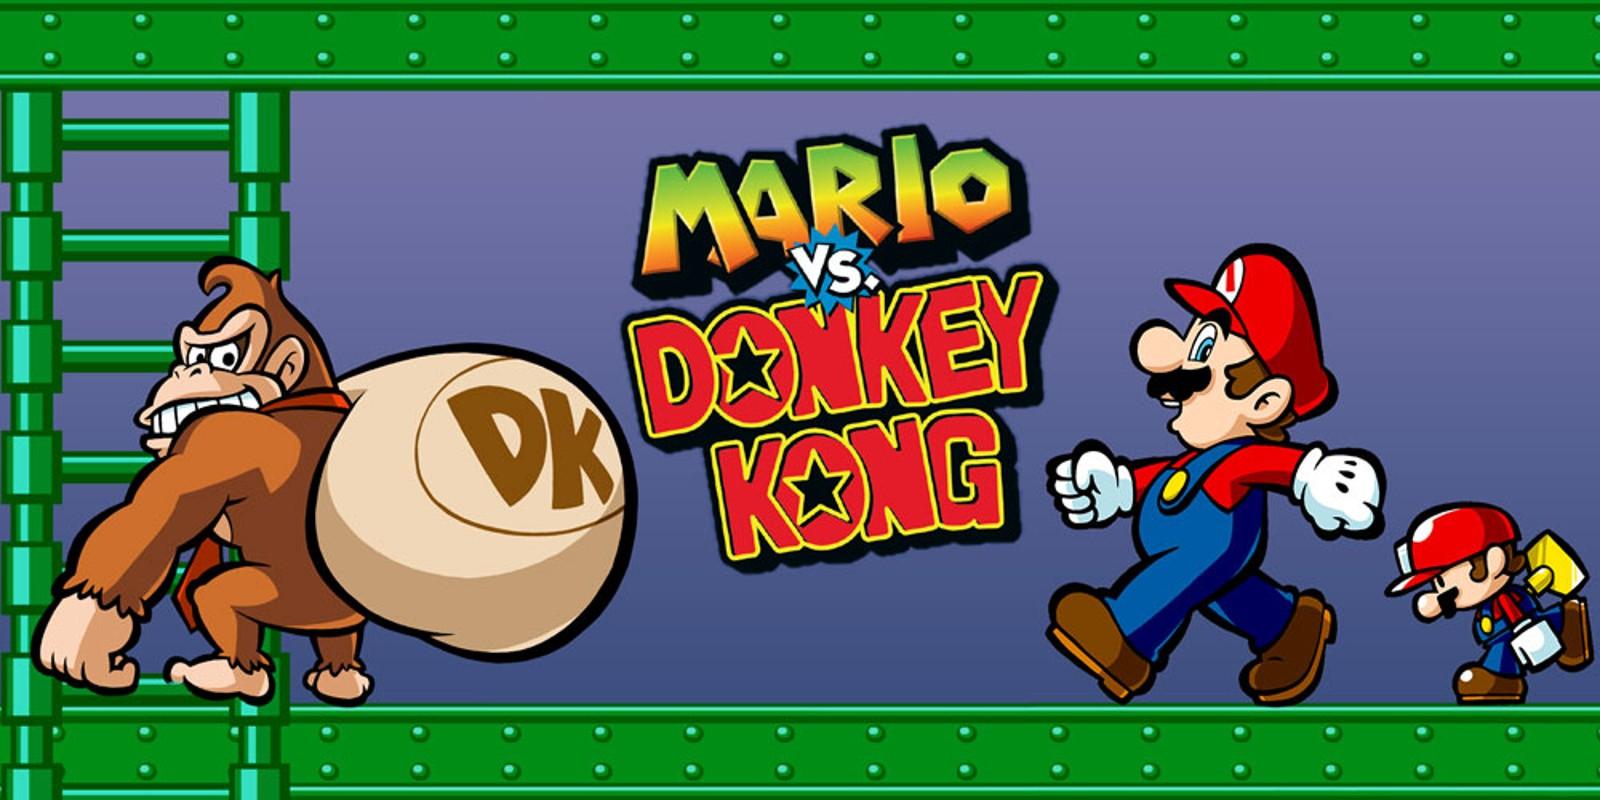 Legend of Zelda and Donkey Kong mobile games